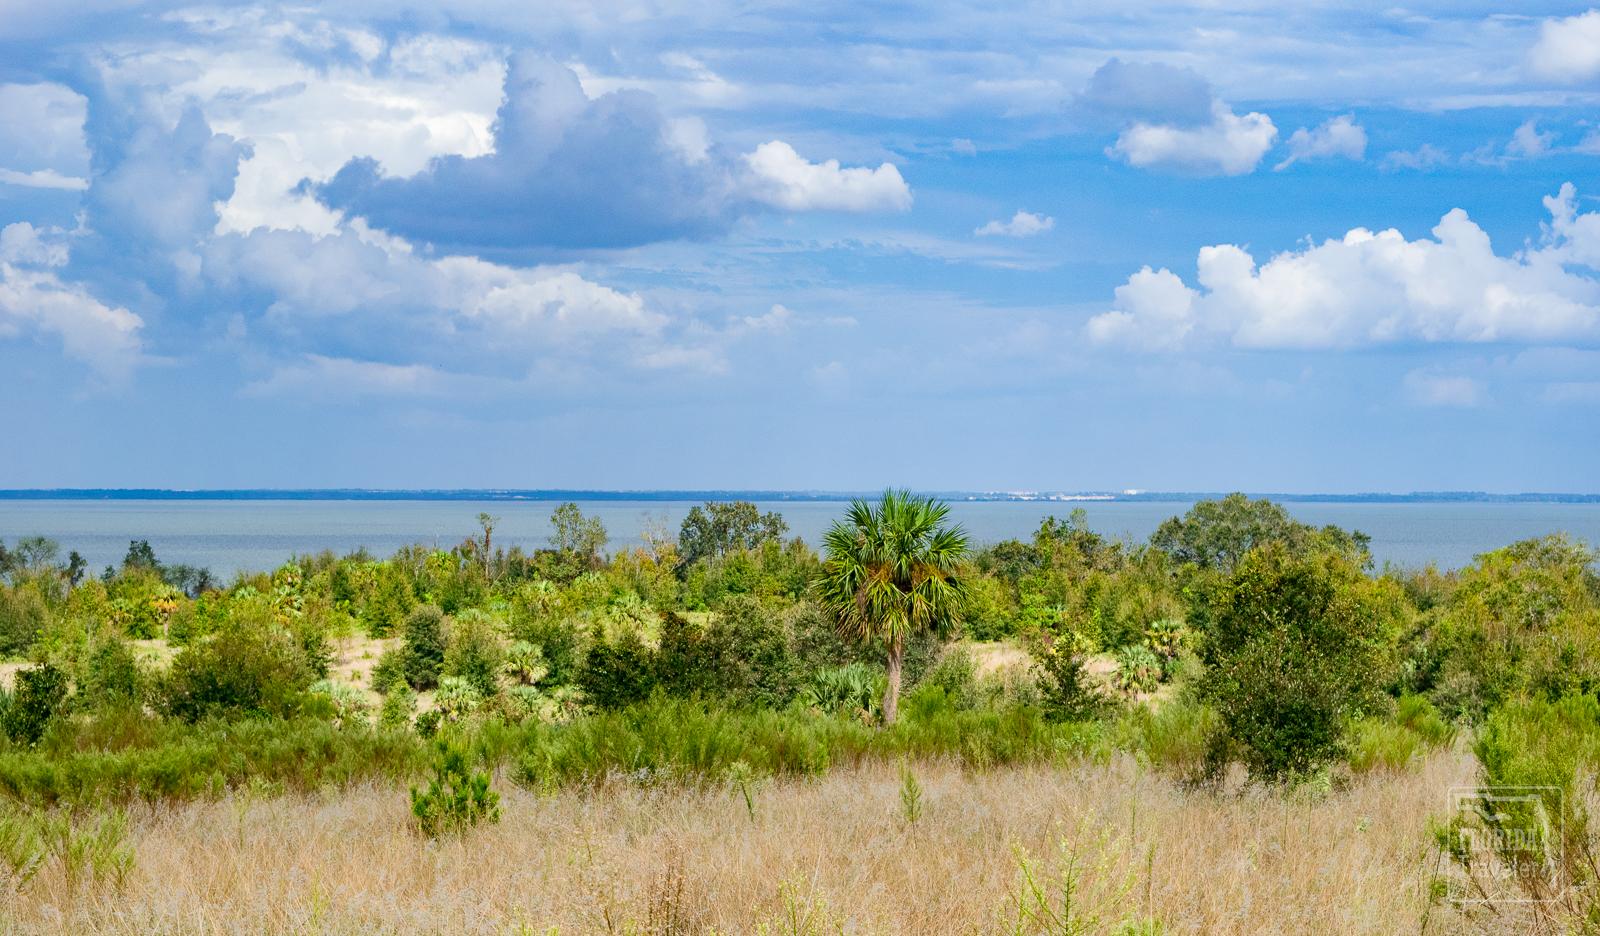 Ferndale Preserve - Ferndale, FL